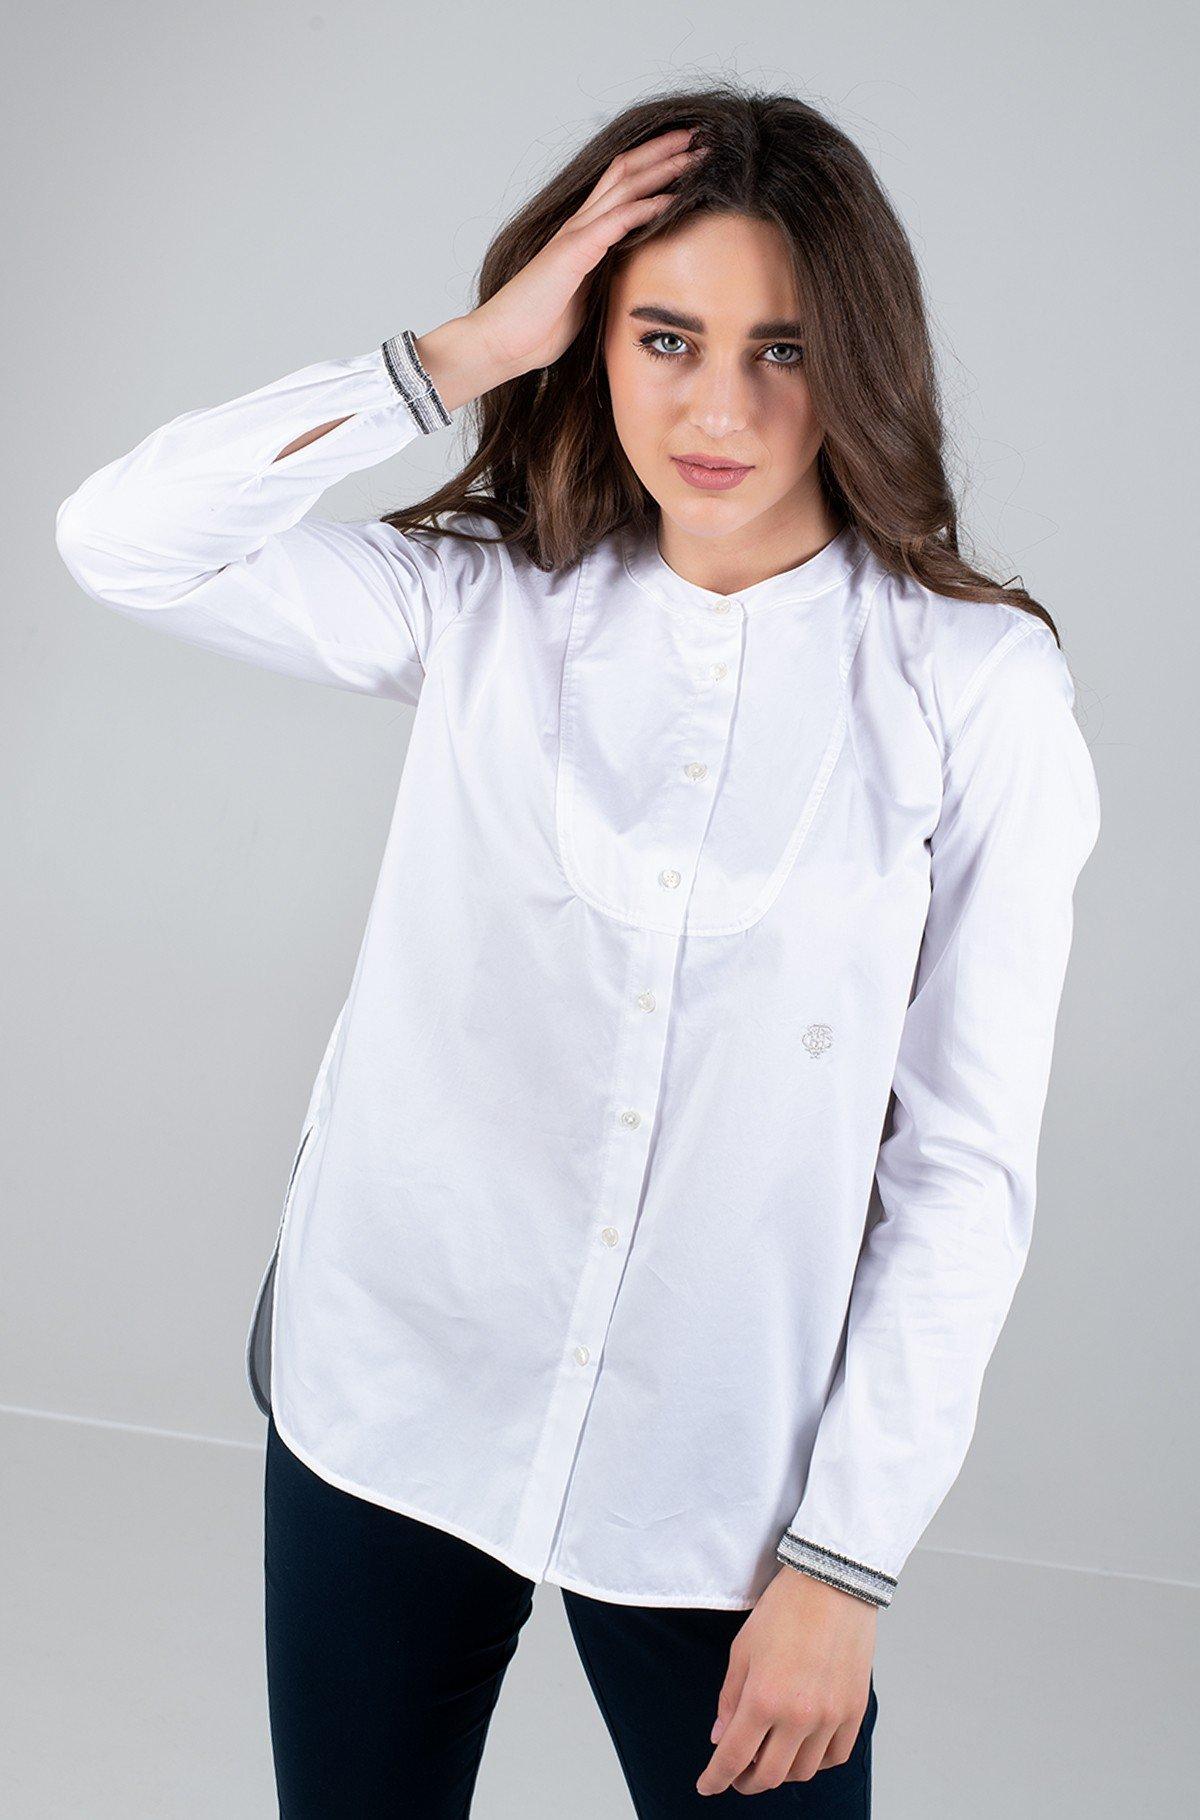 Marškiniai OC DEBBIE SHIRT LS W4-full-2